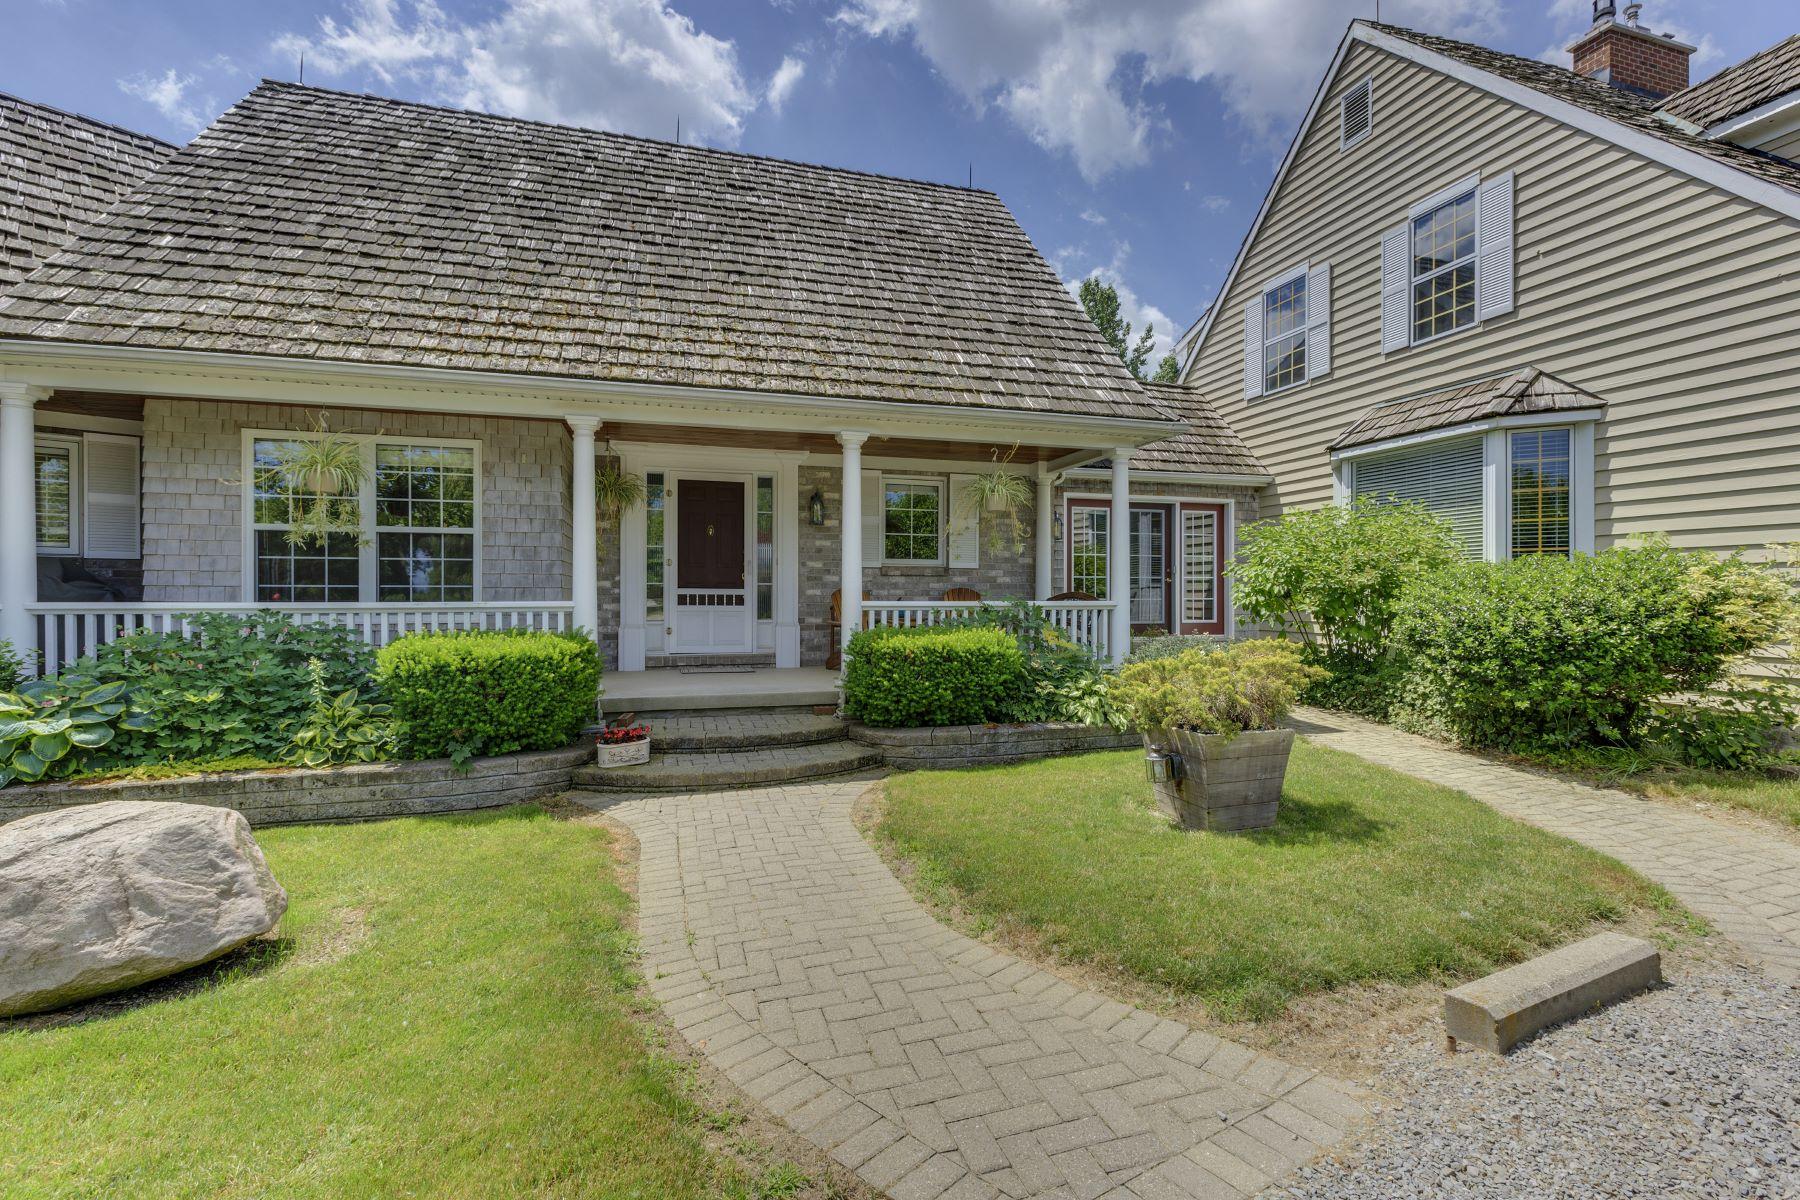 Частный односемейный дом для того Продажа на Niagara-on-the-Lake B&B 1289 Larkin Road Niagara On The Lake, Онтарио L0S1J0 Канада